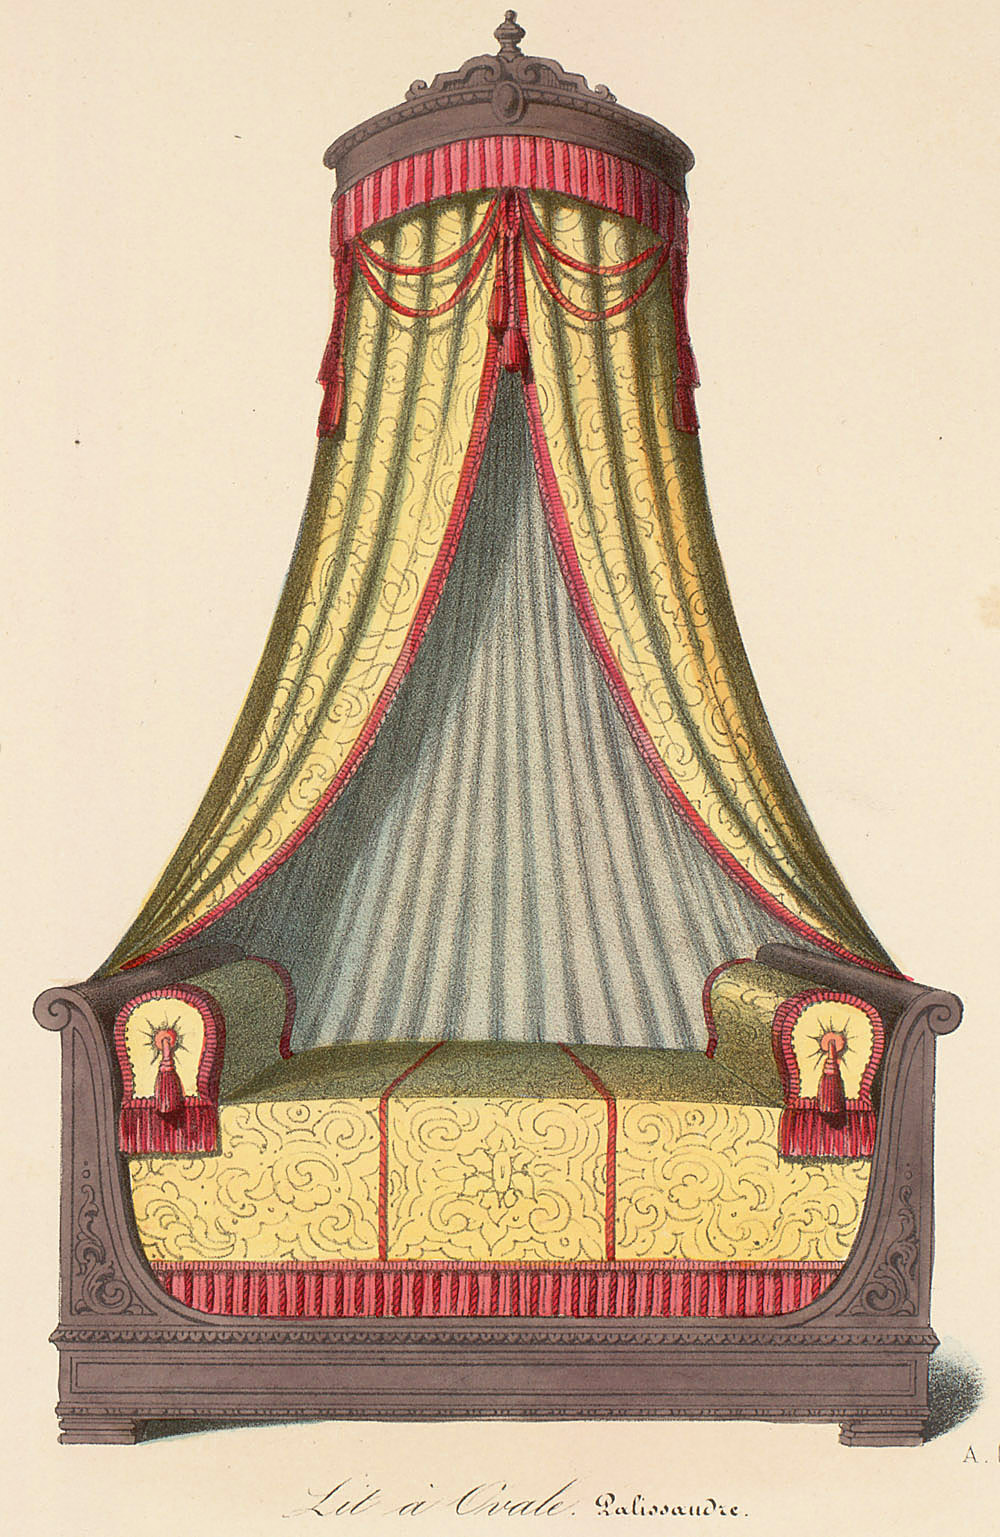 Beds (furniture),  Image number:SIL12-2-052c